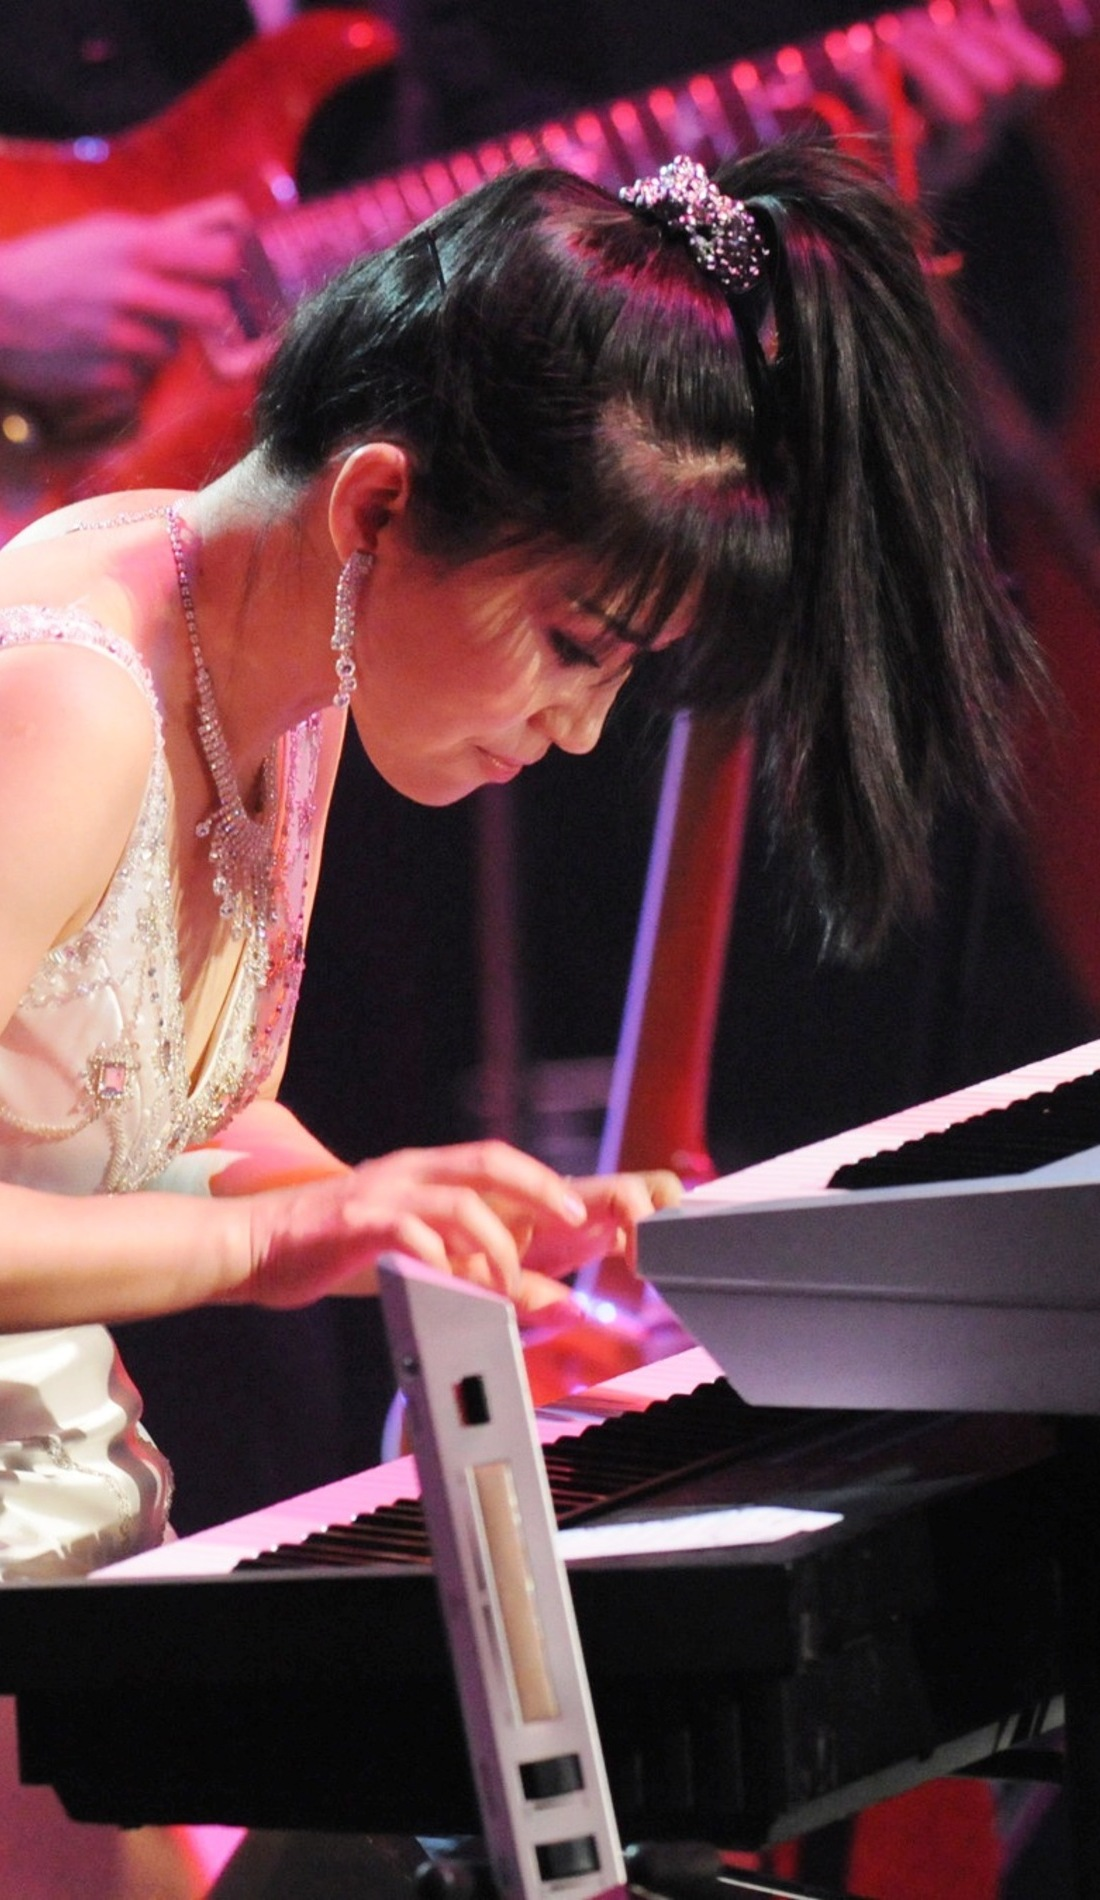 A Keiko Matsui live event